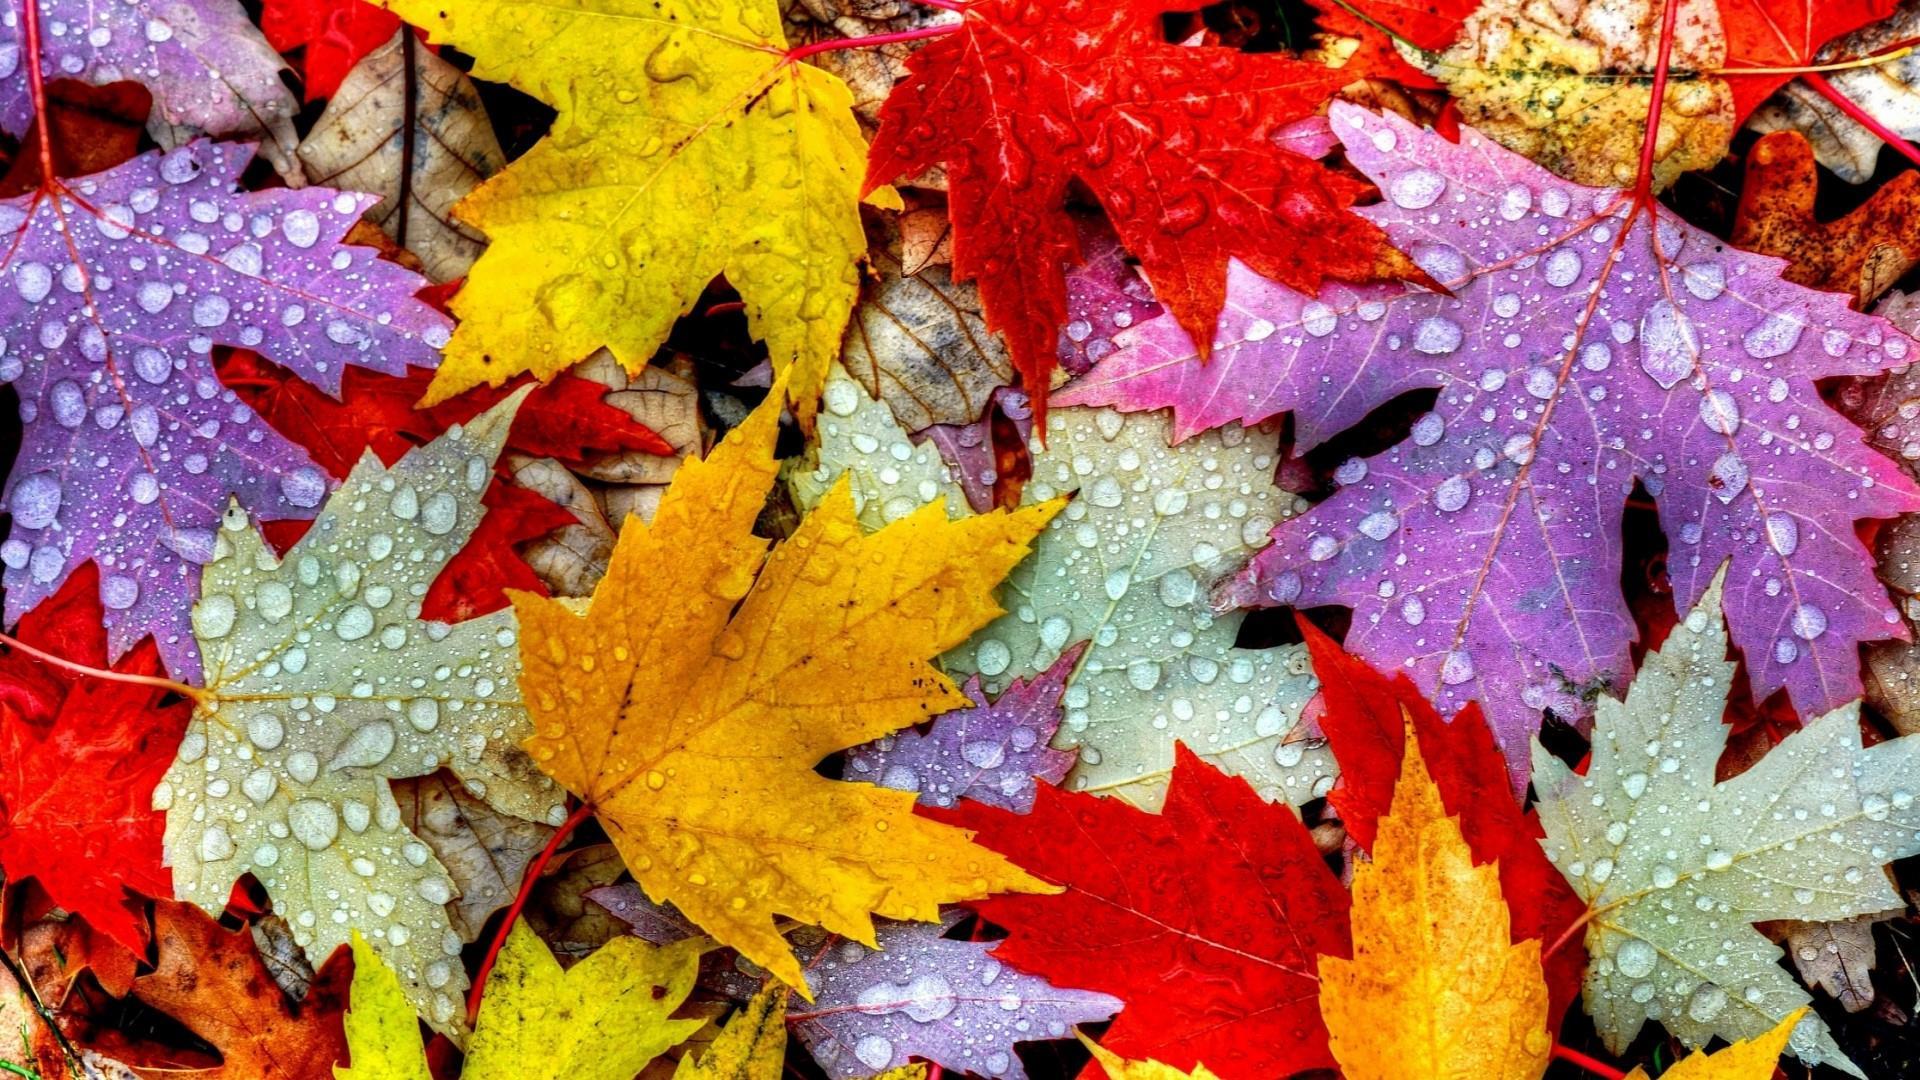 Colorful Maple Leaves Wallpaper | Wallpaper Studio 10 | Tens of ...